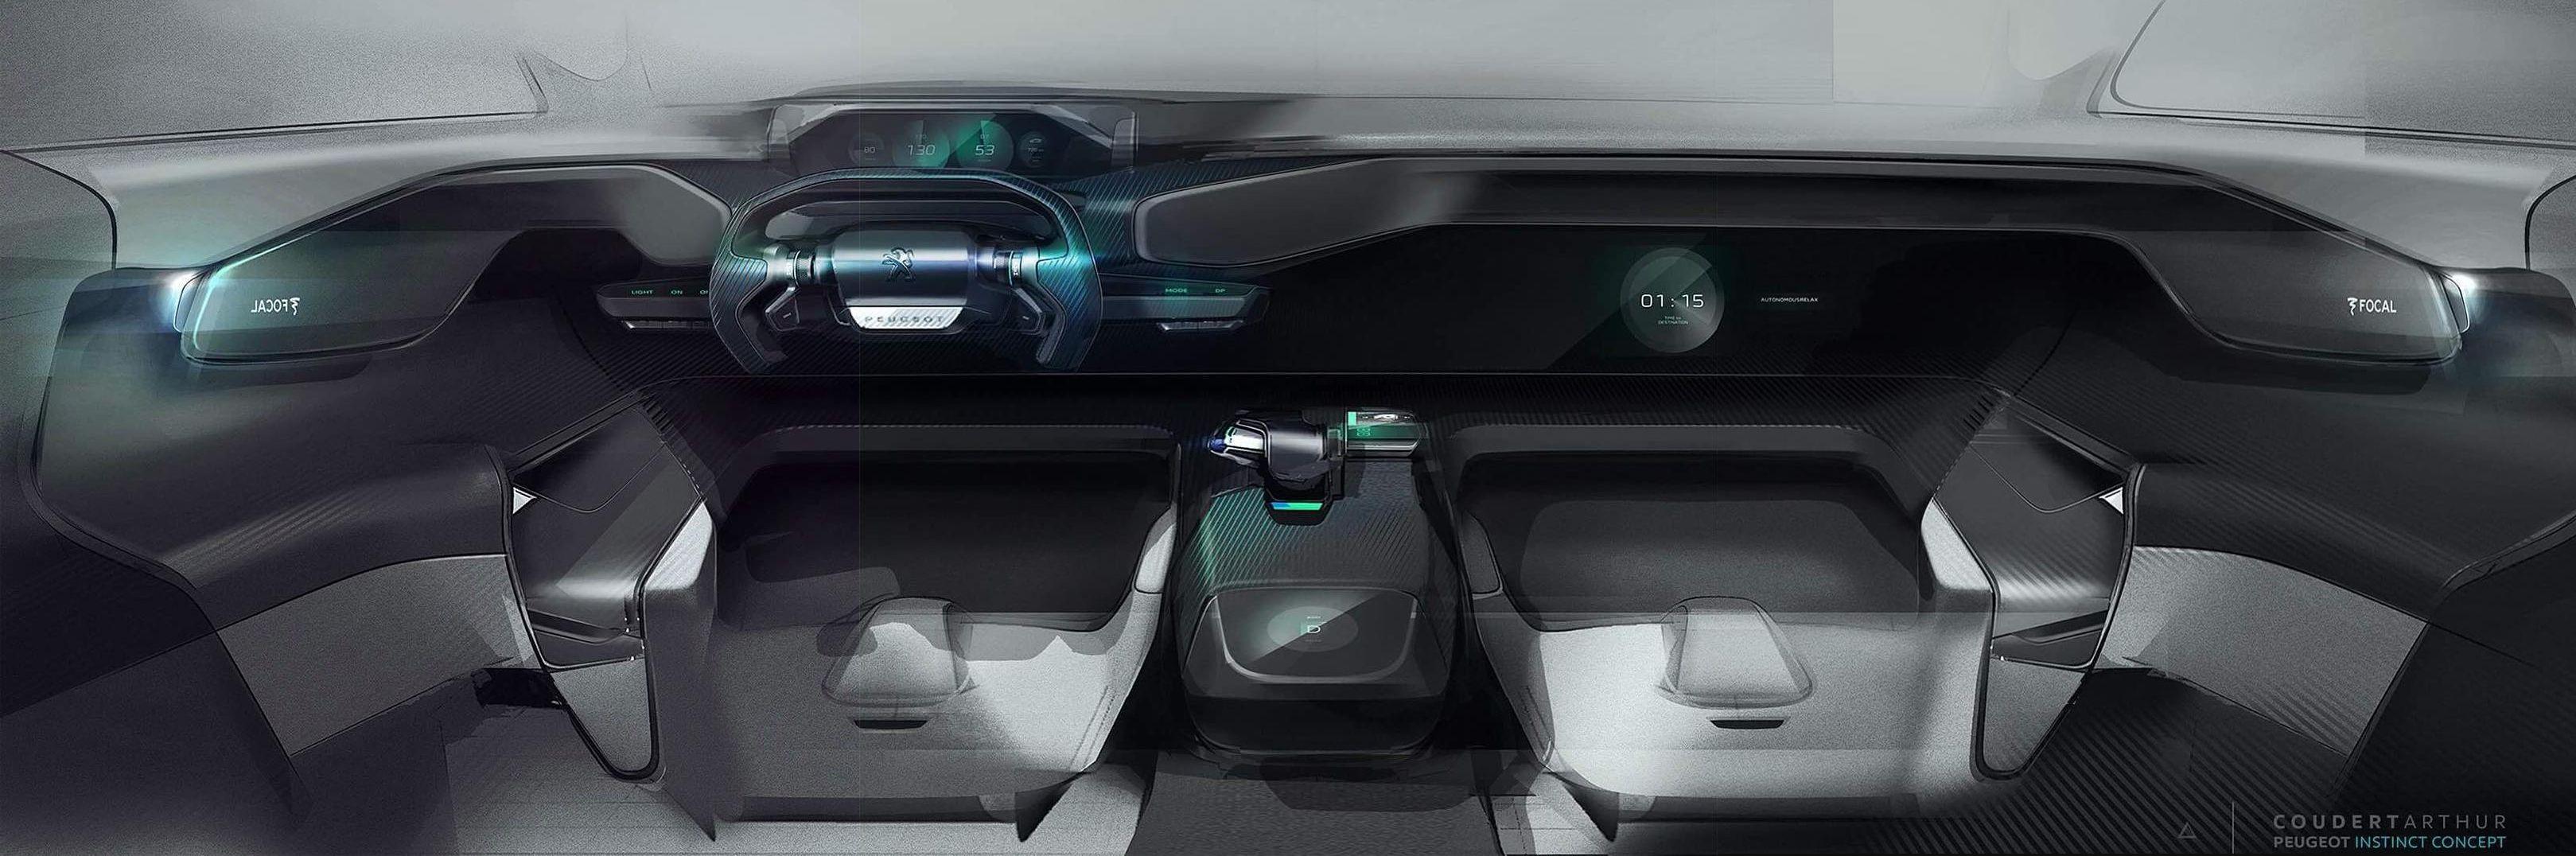 Arthur Coudert With Images Car Interior Design Car Interior